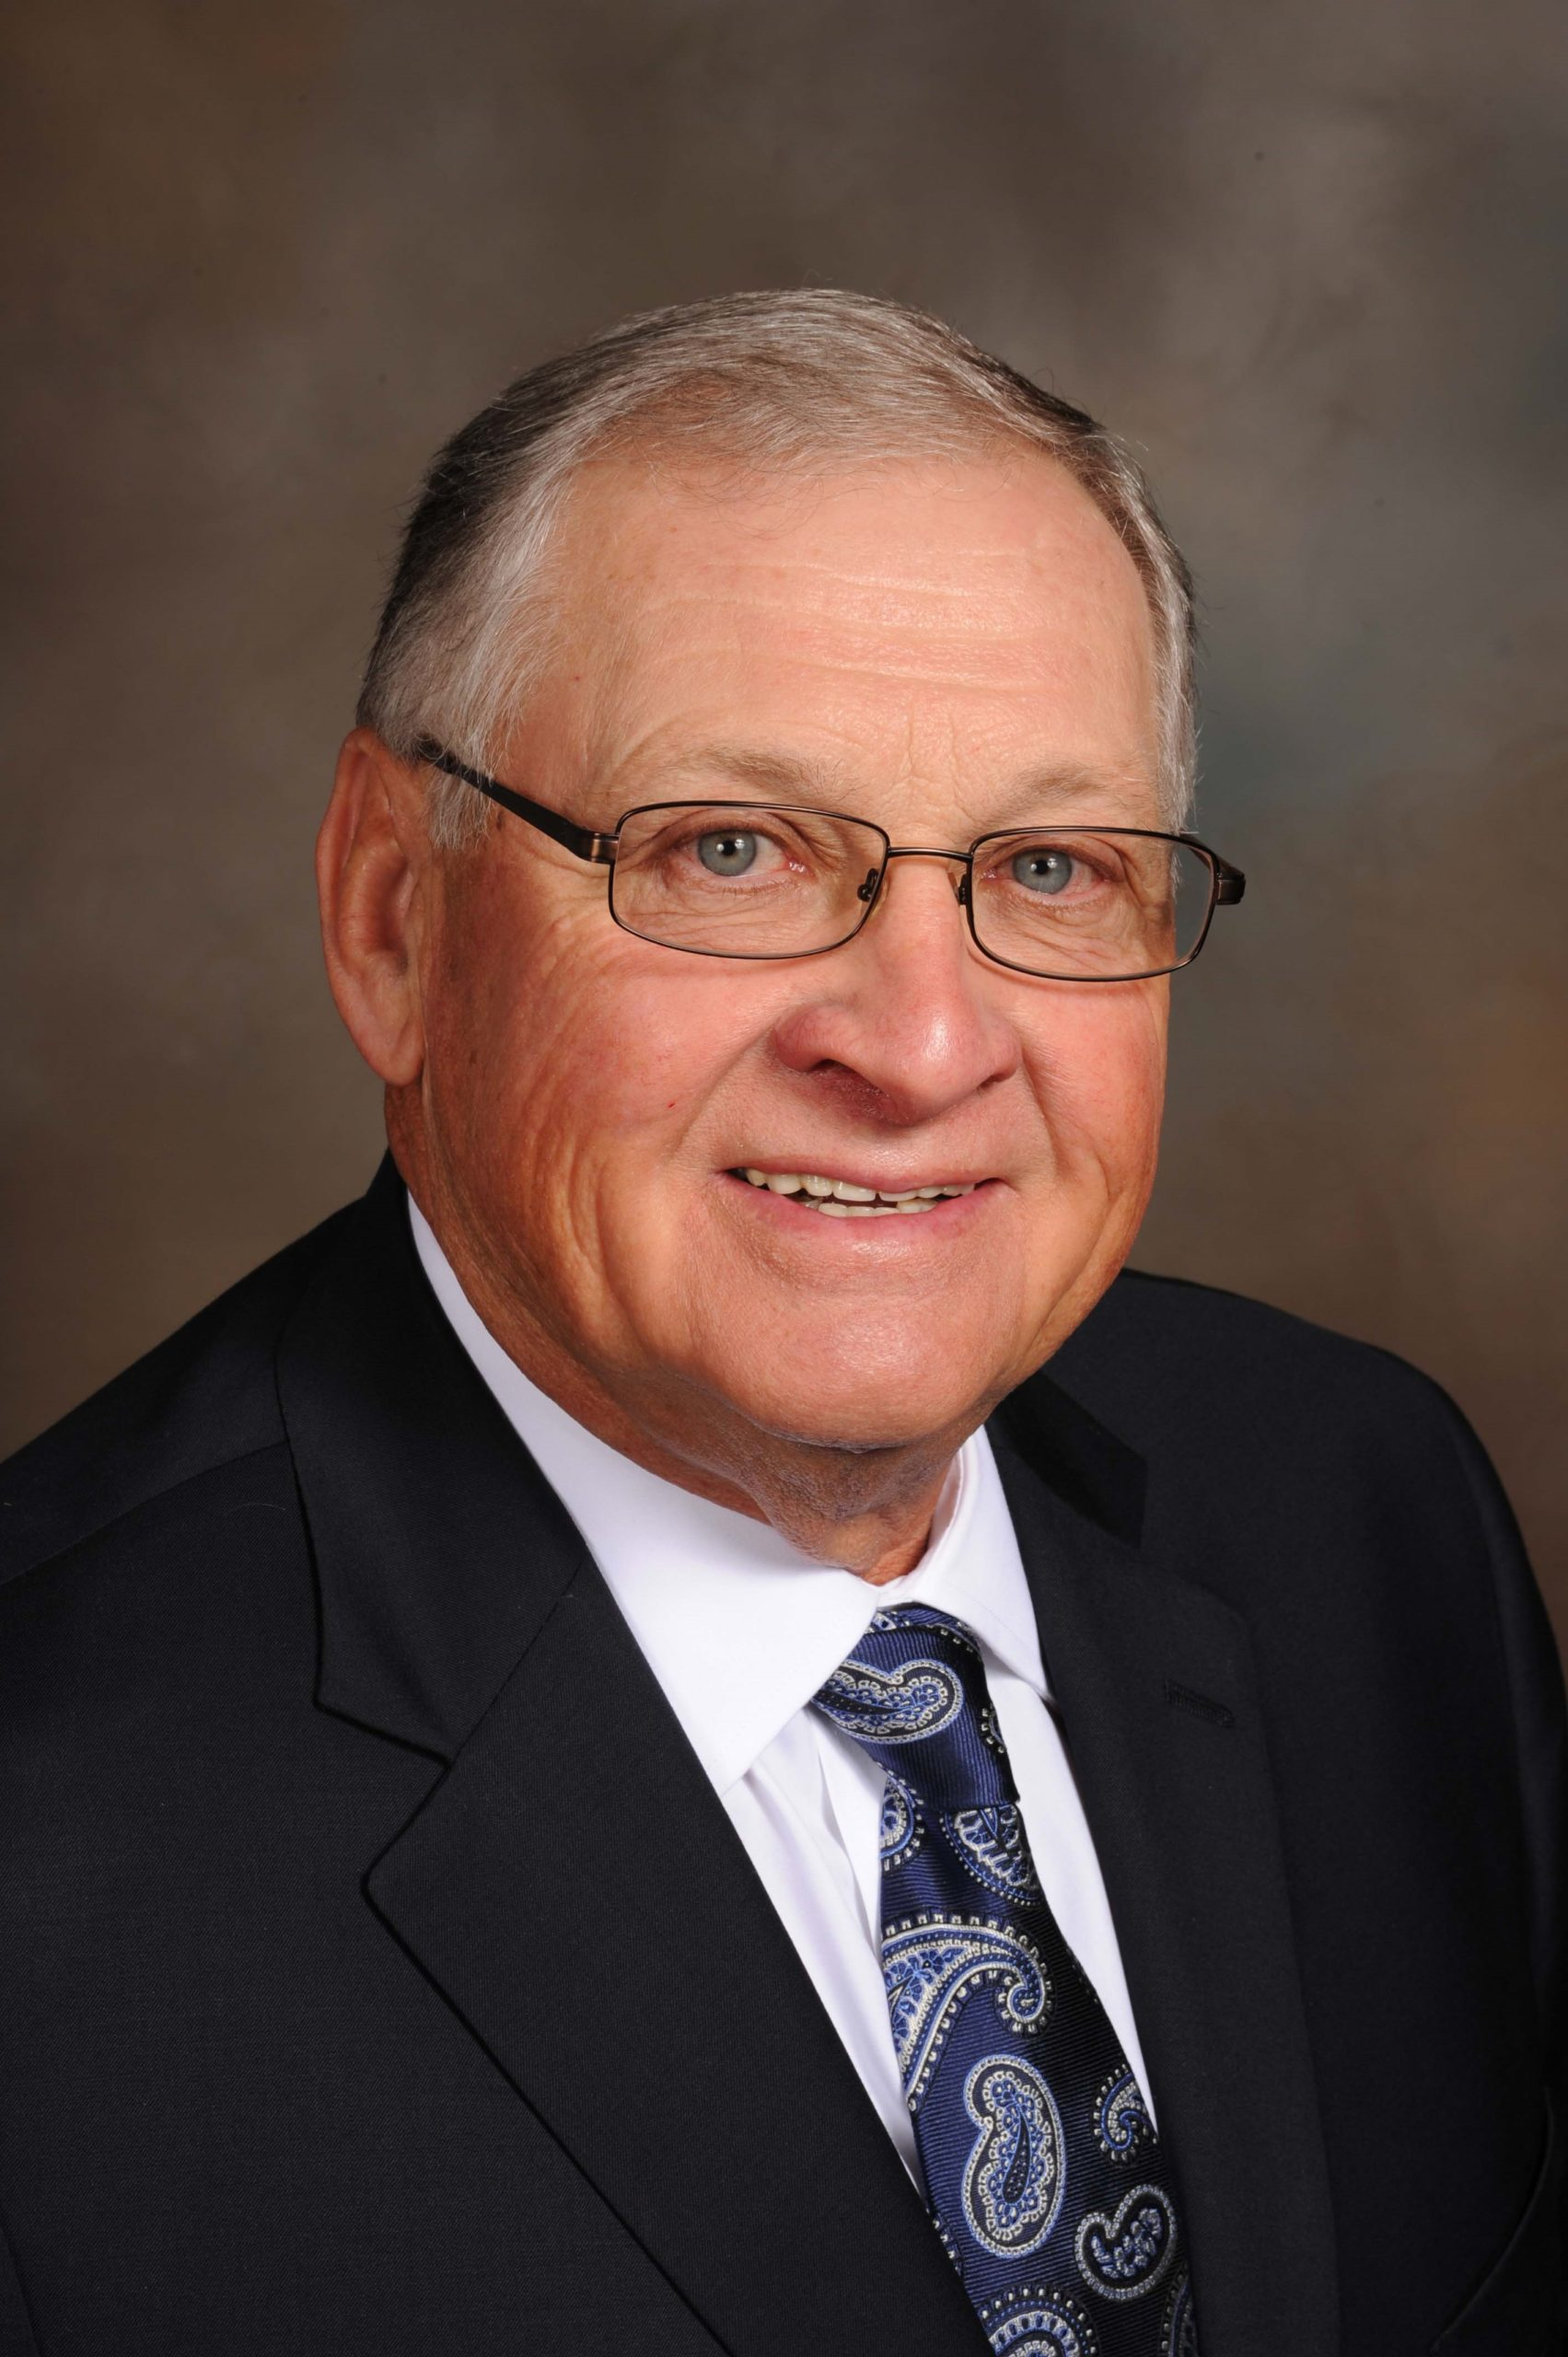 Dale DeWitt